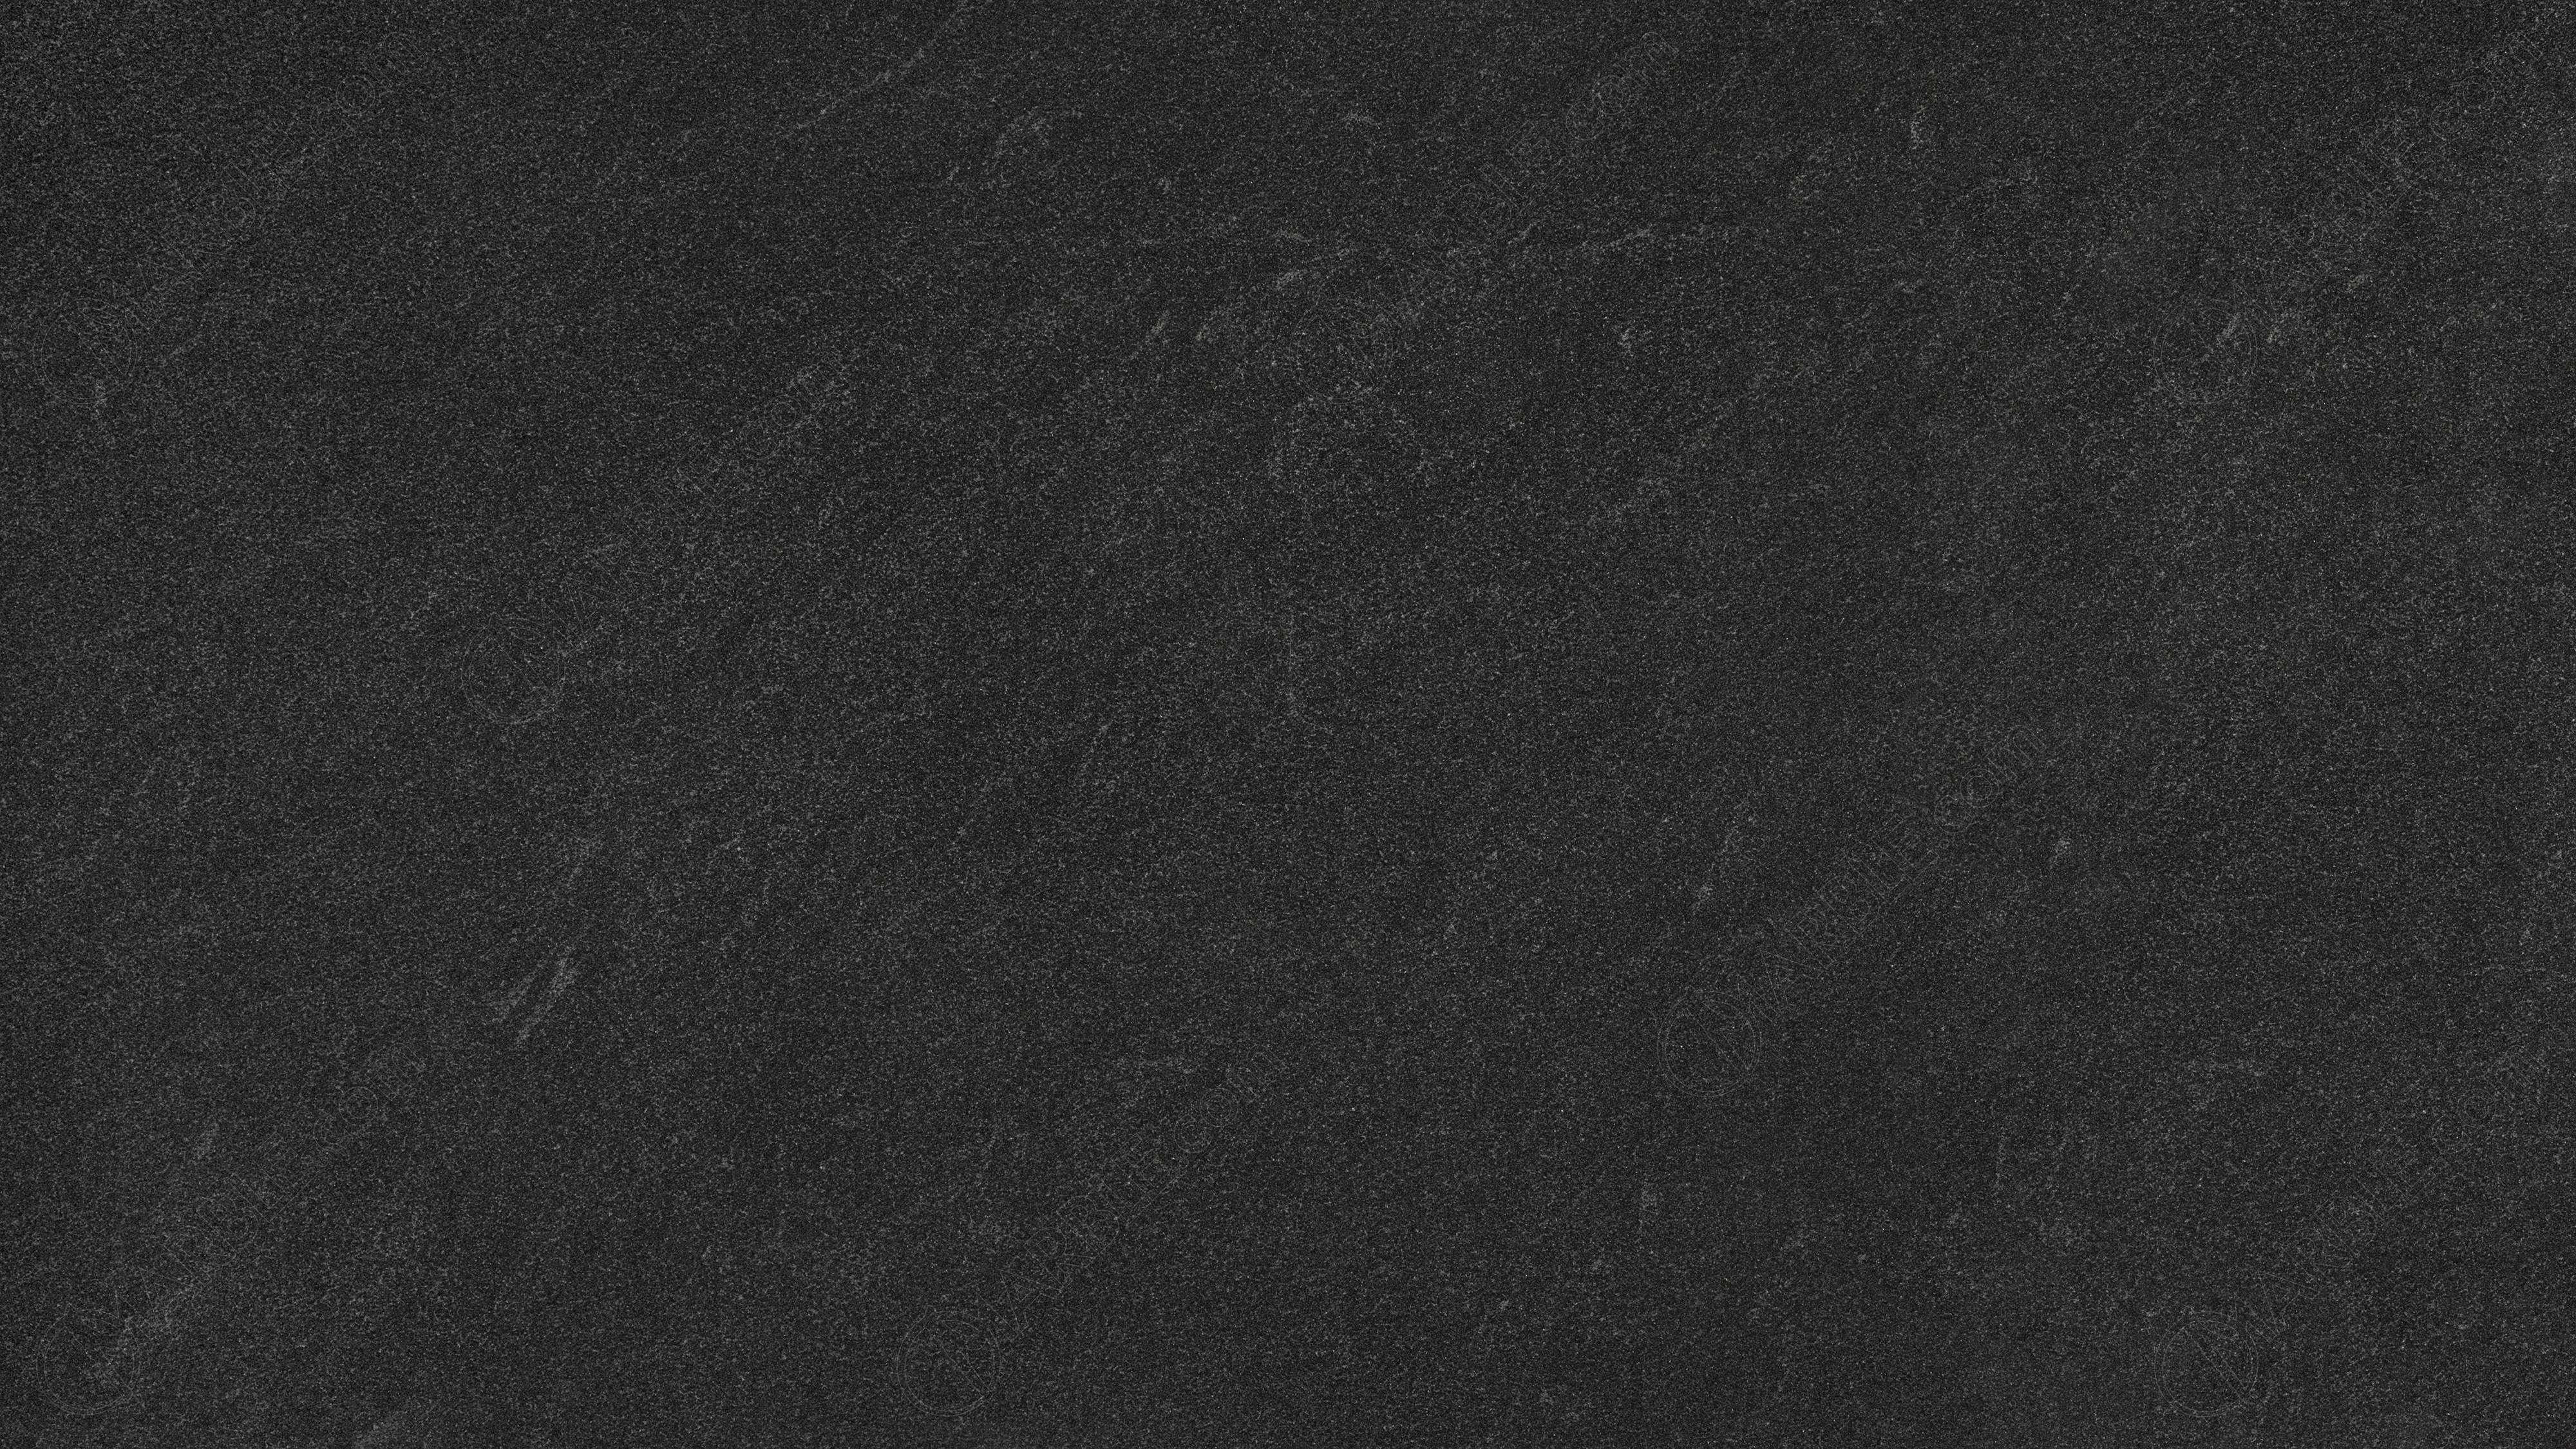 2Cm Absolute Black Leather Finished Slab